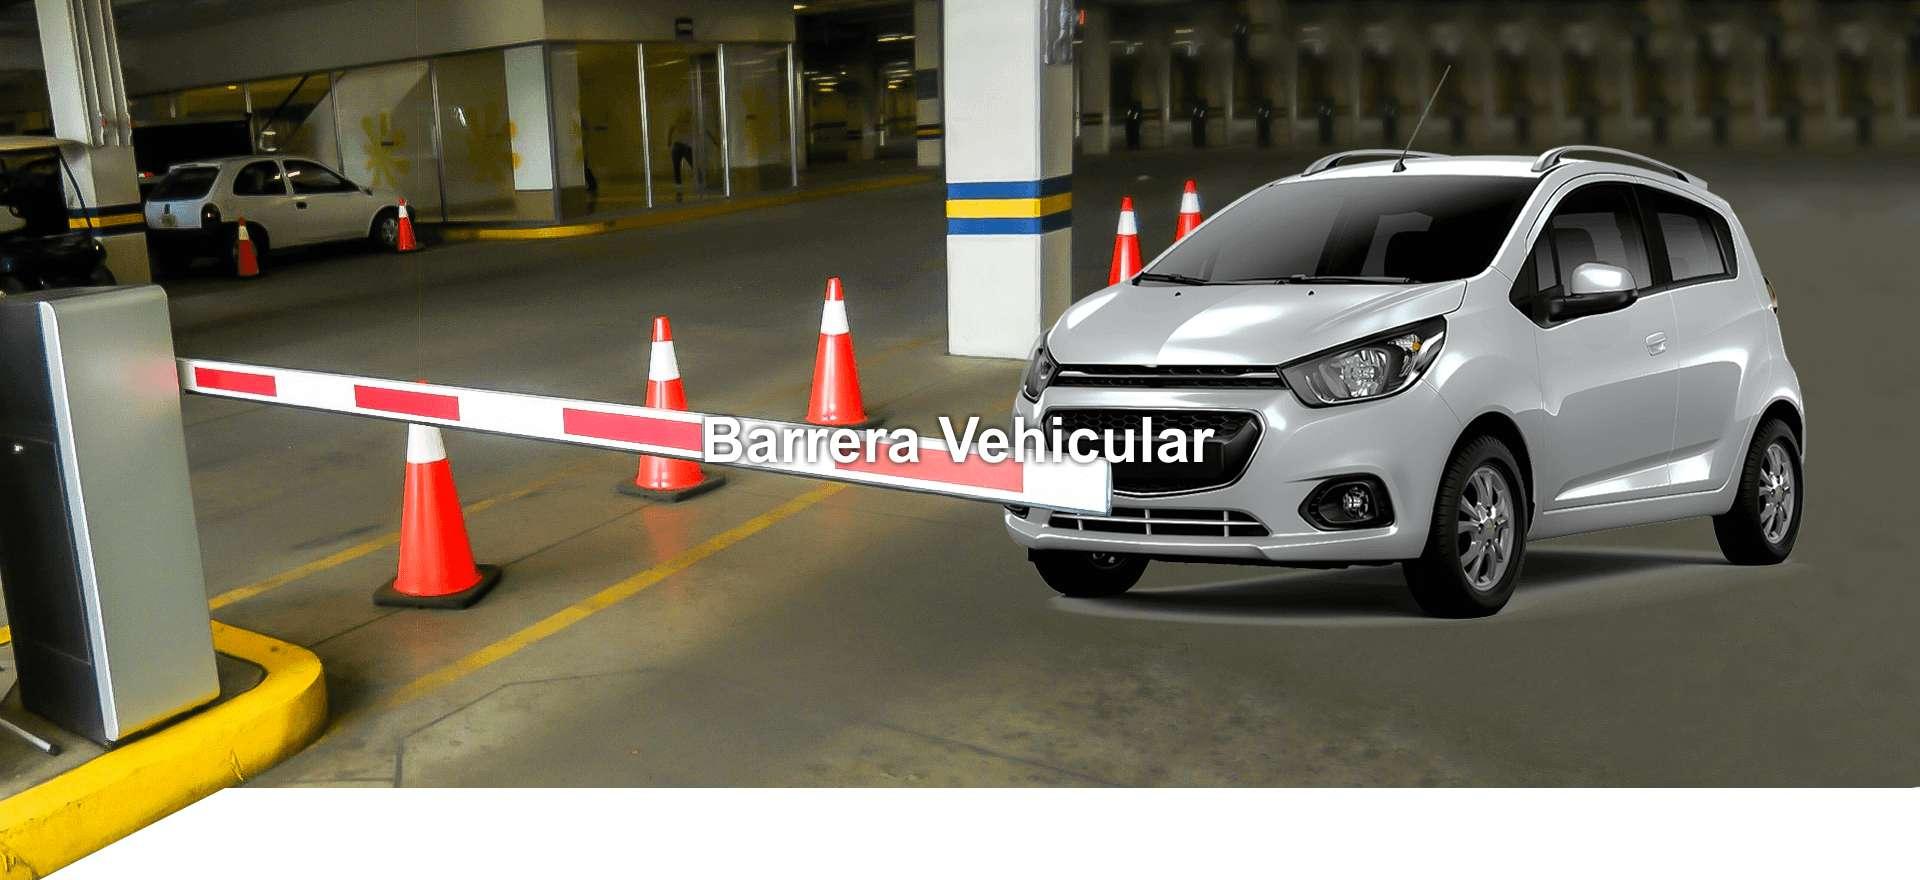 Barrera Vehicular para Control de Acceso en Estacionamientos, Venta e Instalación en Lázaro Cárdenas, Michoacán e Ixtapa Zihuatanejo, Guerrero